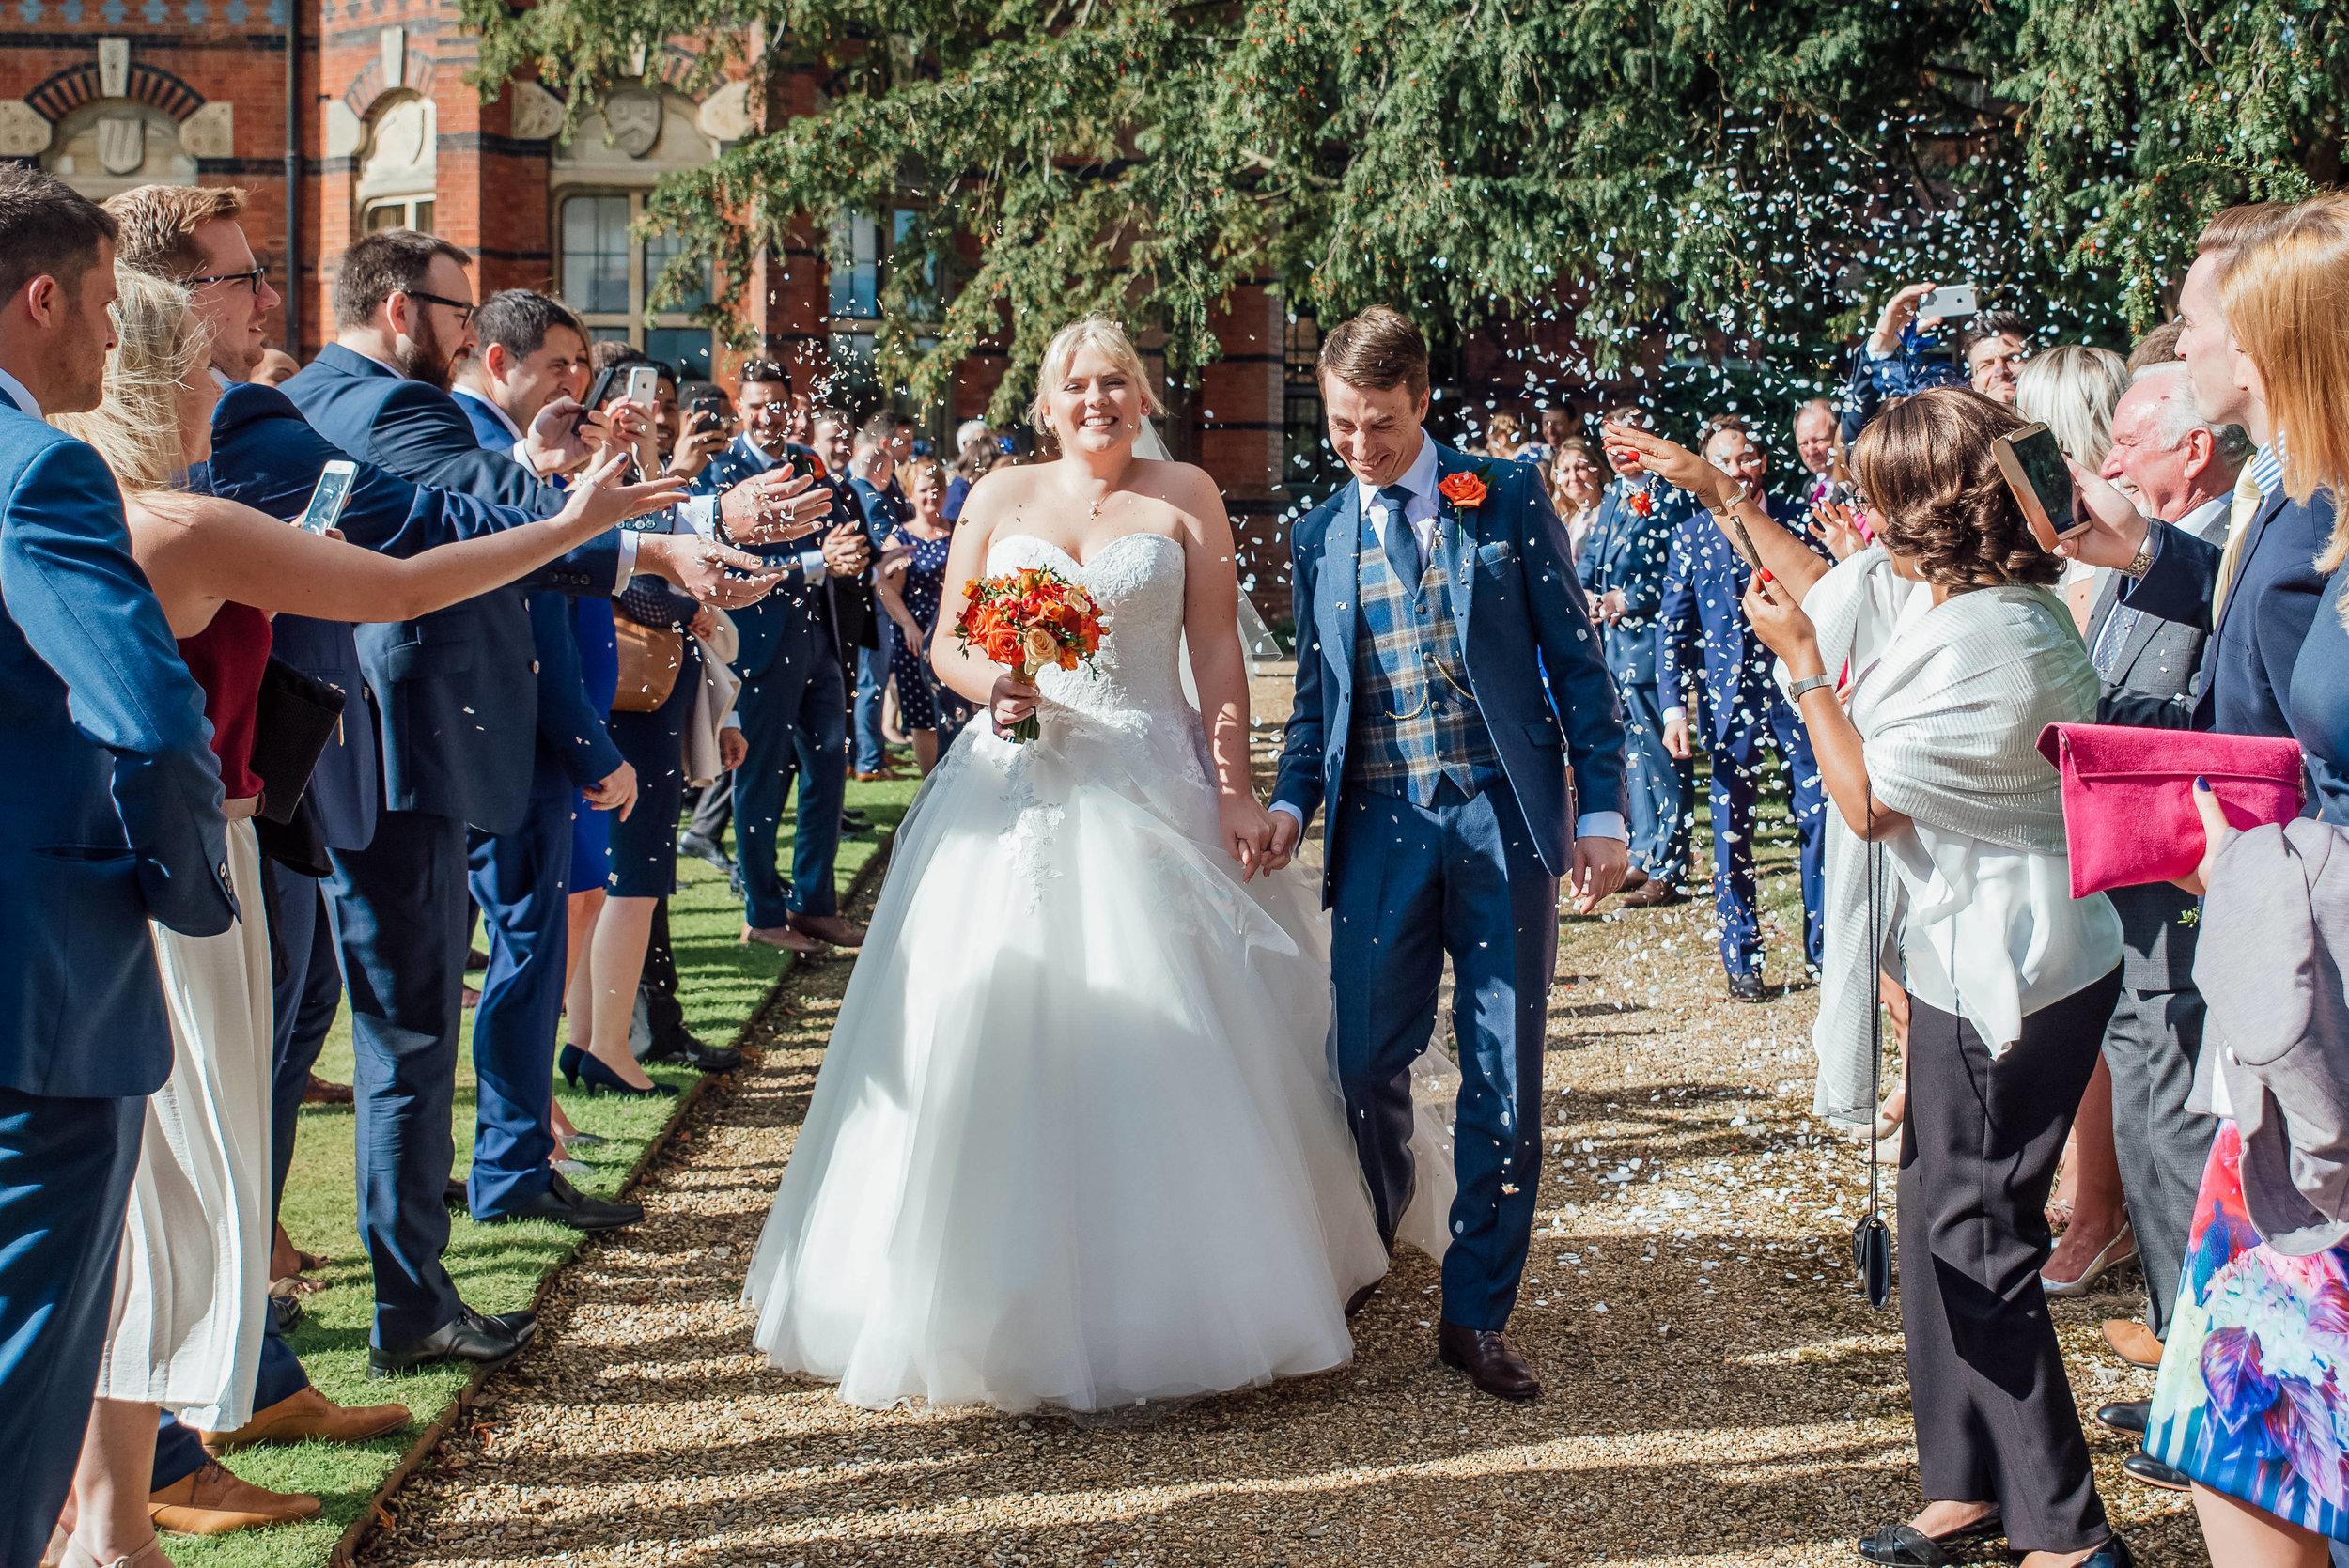 Confetti photograph at The Elvetham Fleet Hampshire - Amy James Photography - Hampshire Wedding Photographer